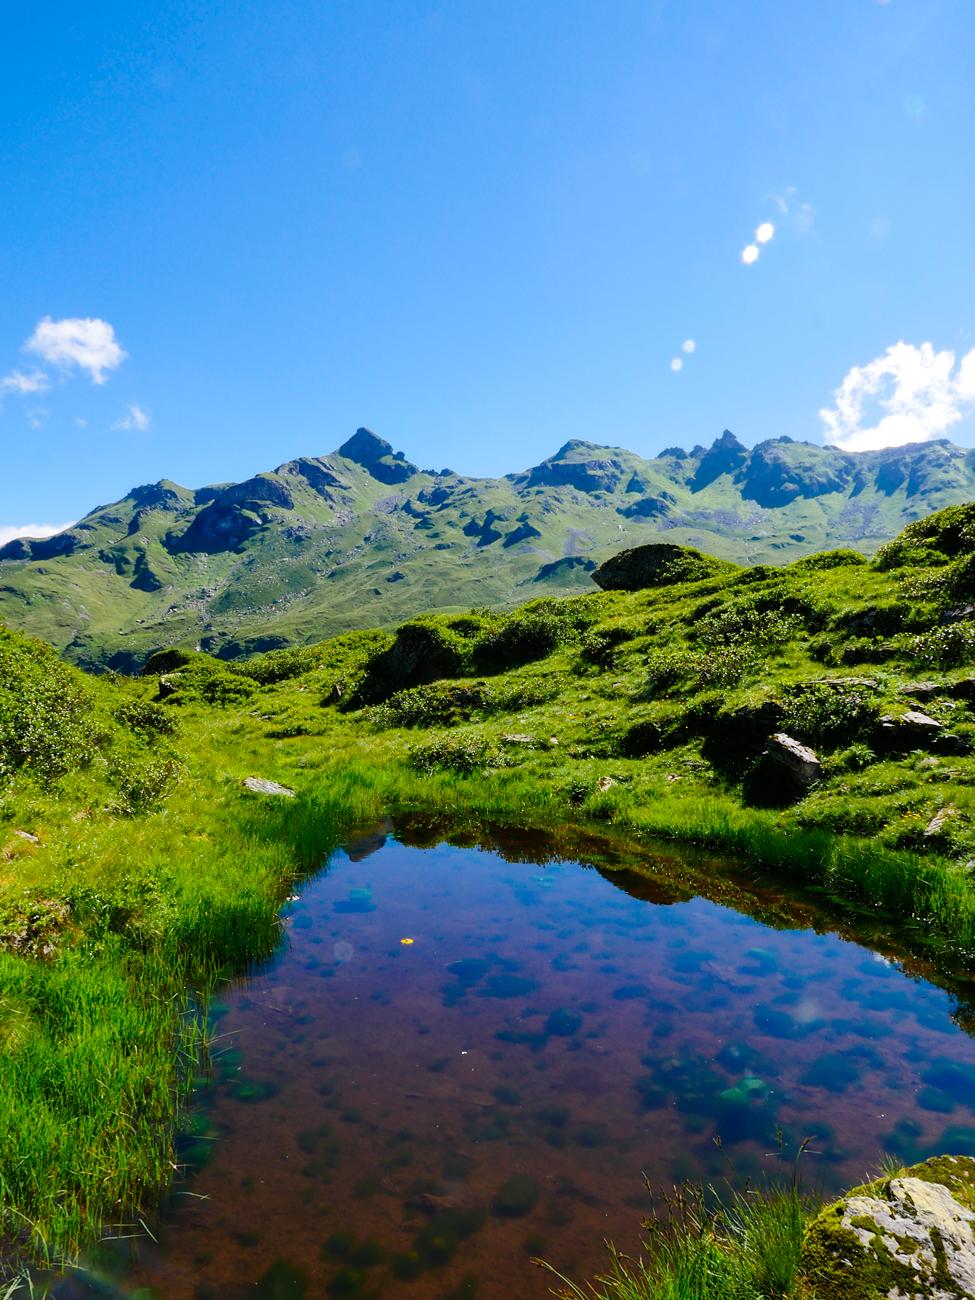 Lake, Mountains and Skies title=100% Natural